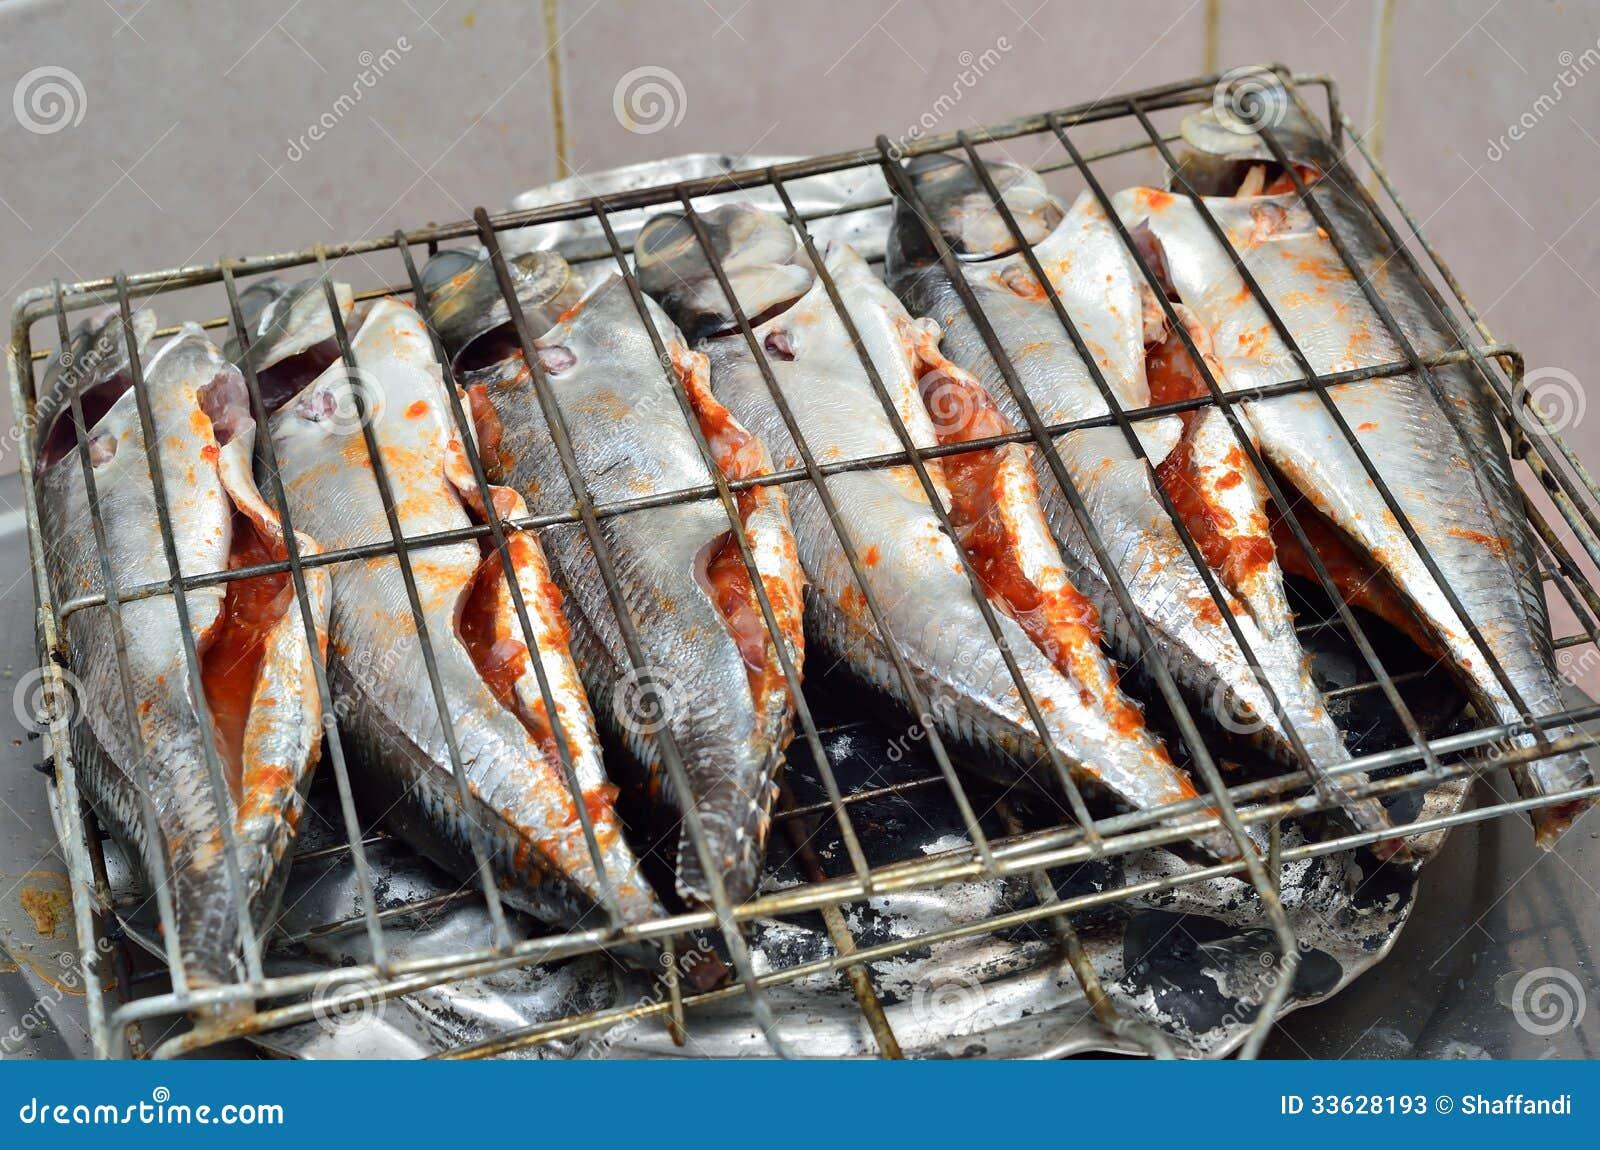 Pescados listos para asar a la parrilla imagen de archivo - Parrillas para asar ...